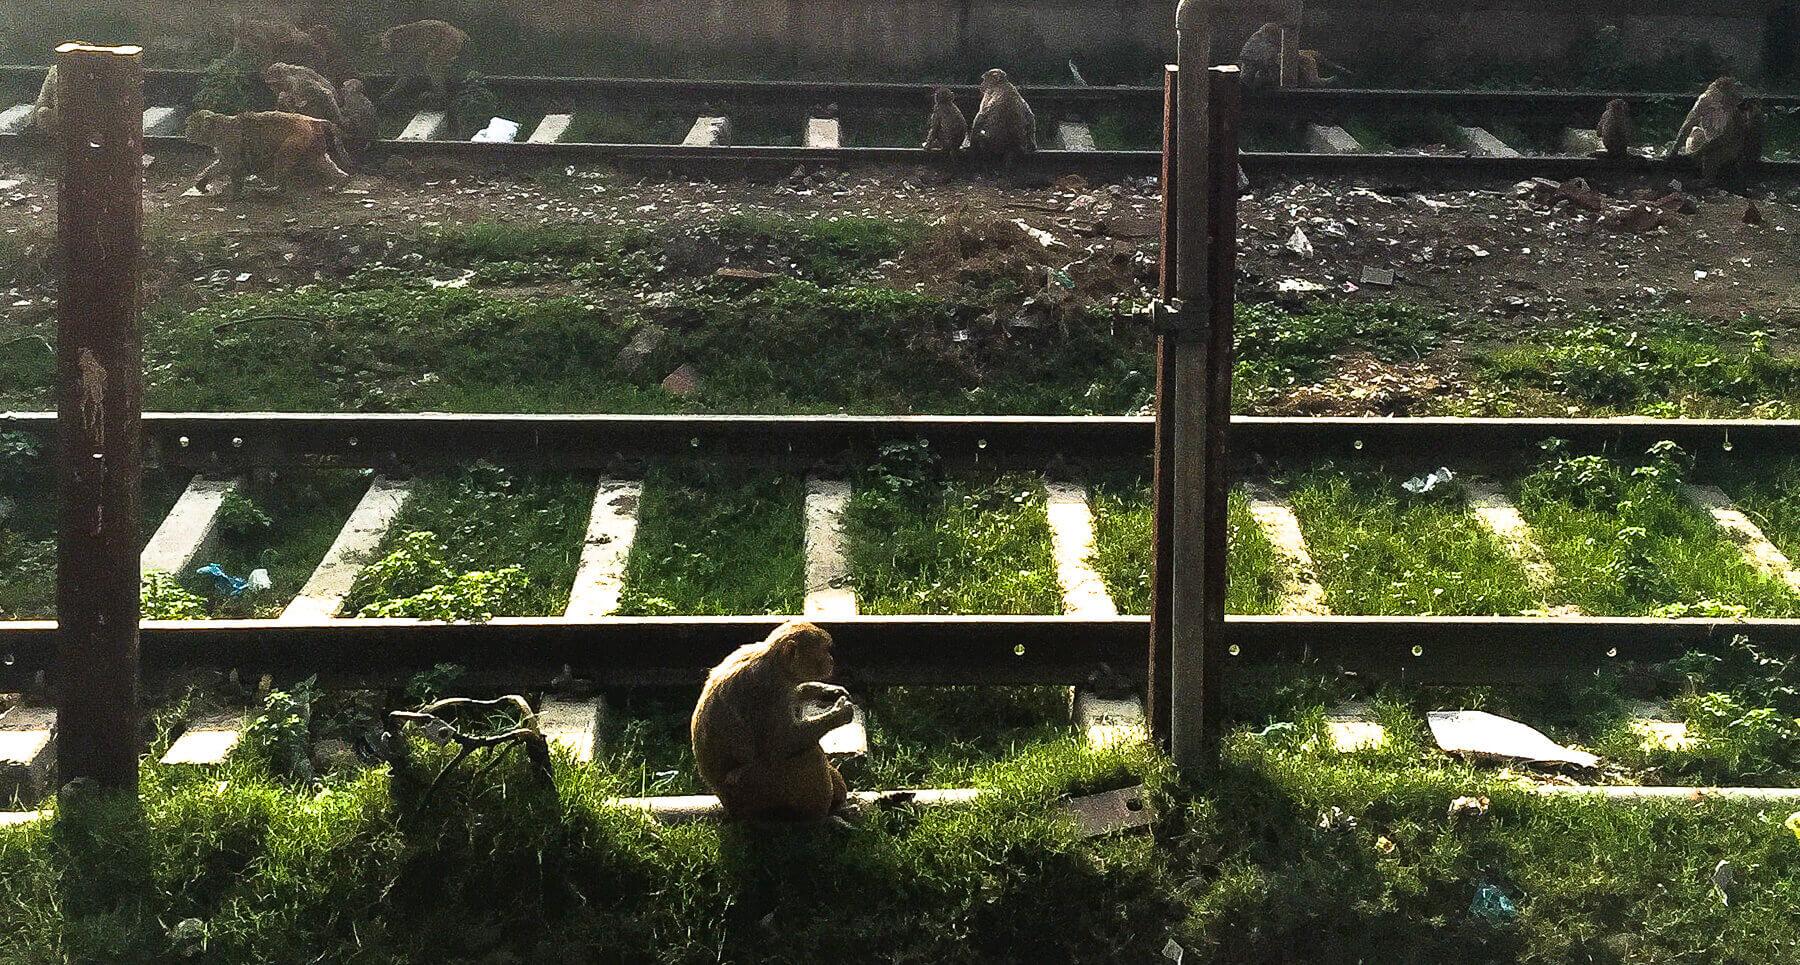 14 monkeys on a railway track